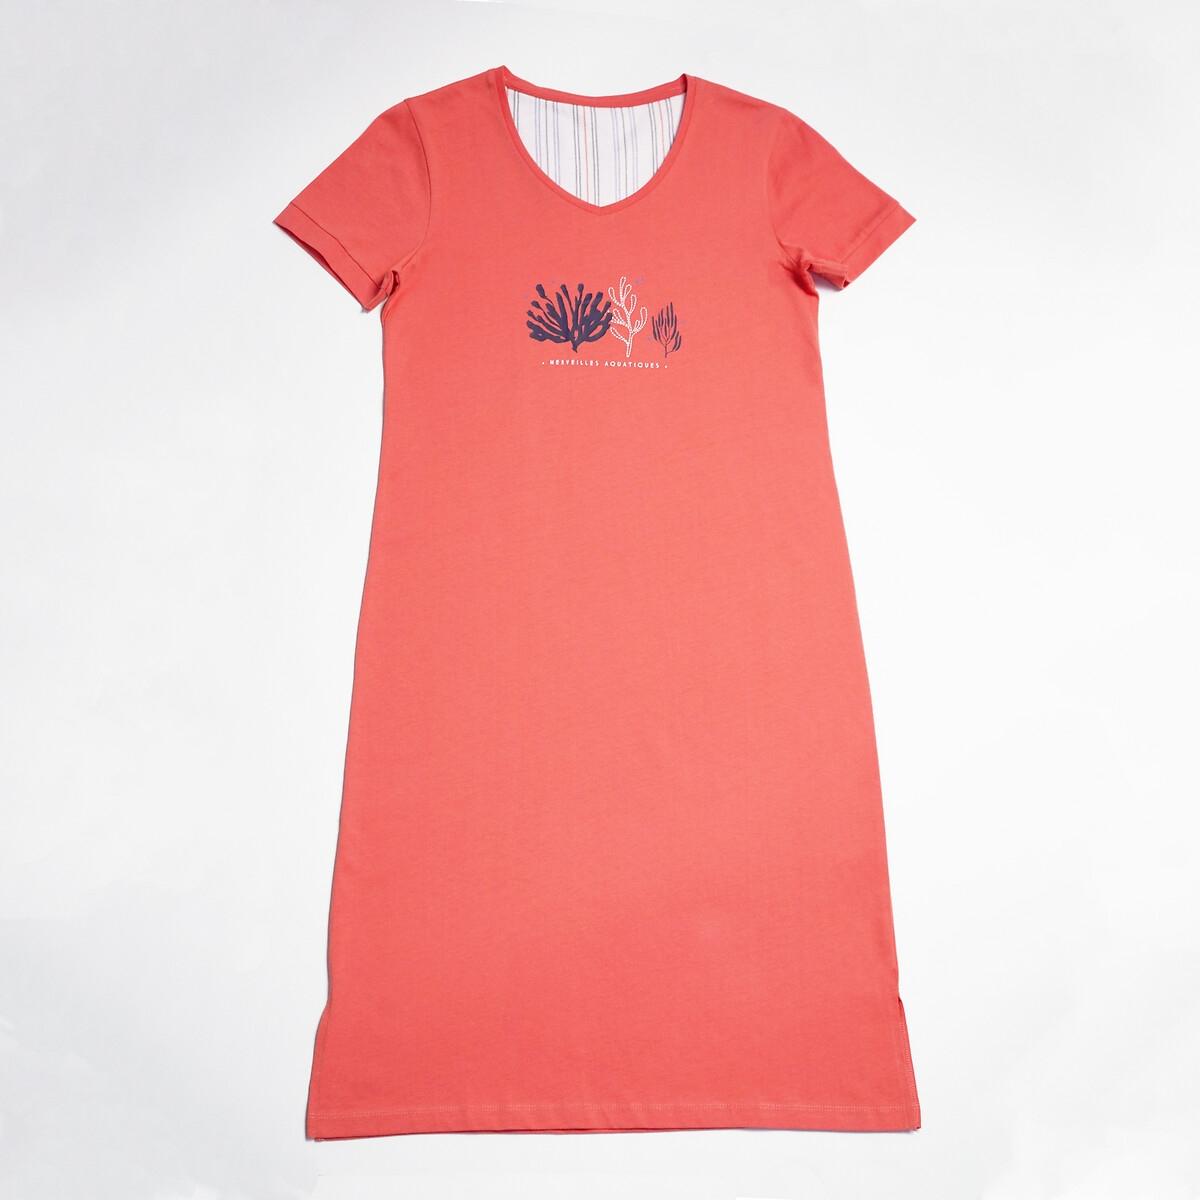 Nightwear Qua Cotton Nightshirt with Short Sleeves